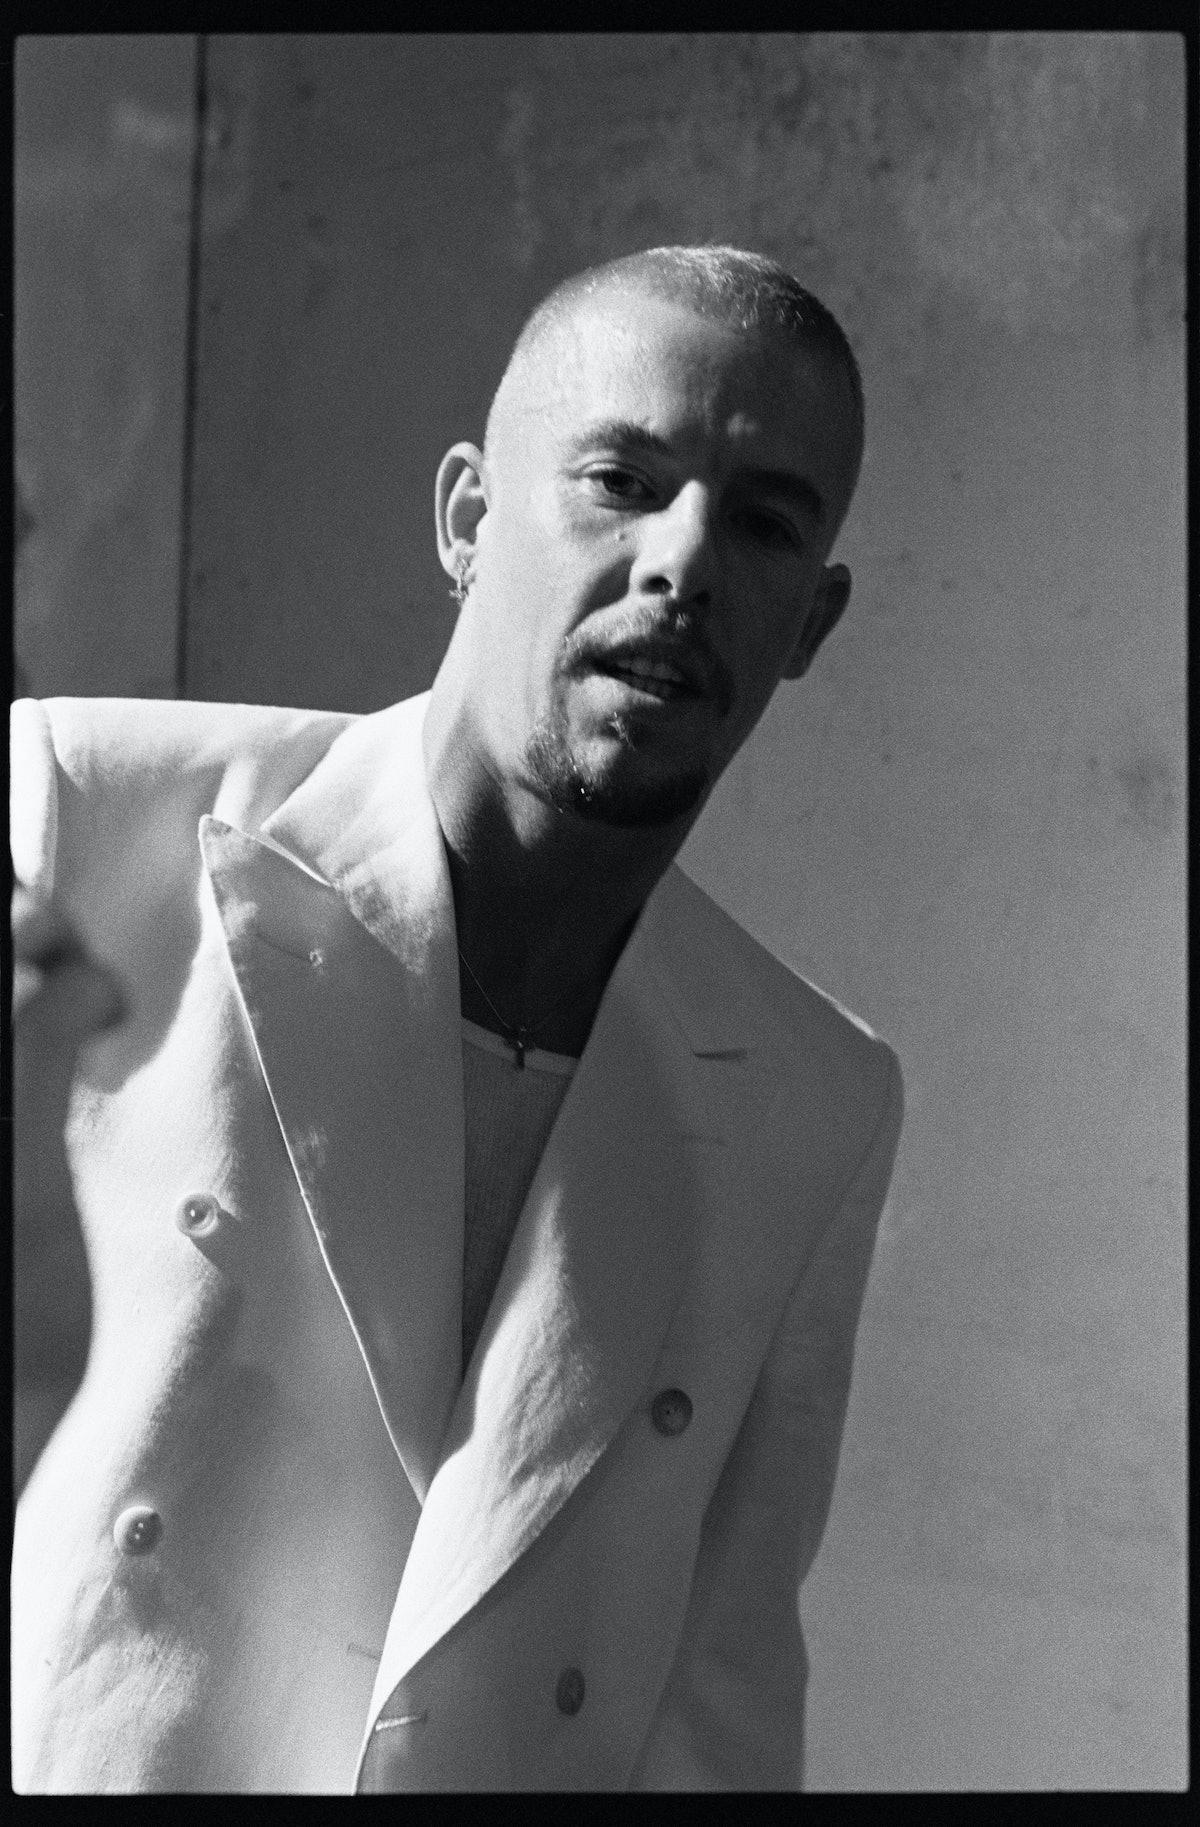 white-suit-ann-ray-2002-lee-mcqueen.jpg